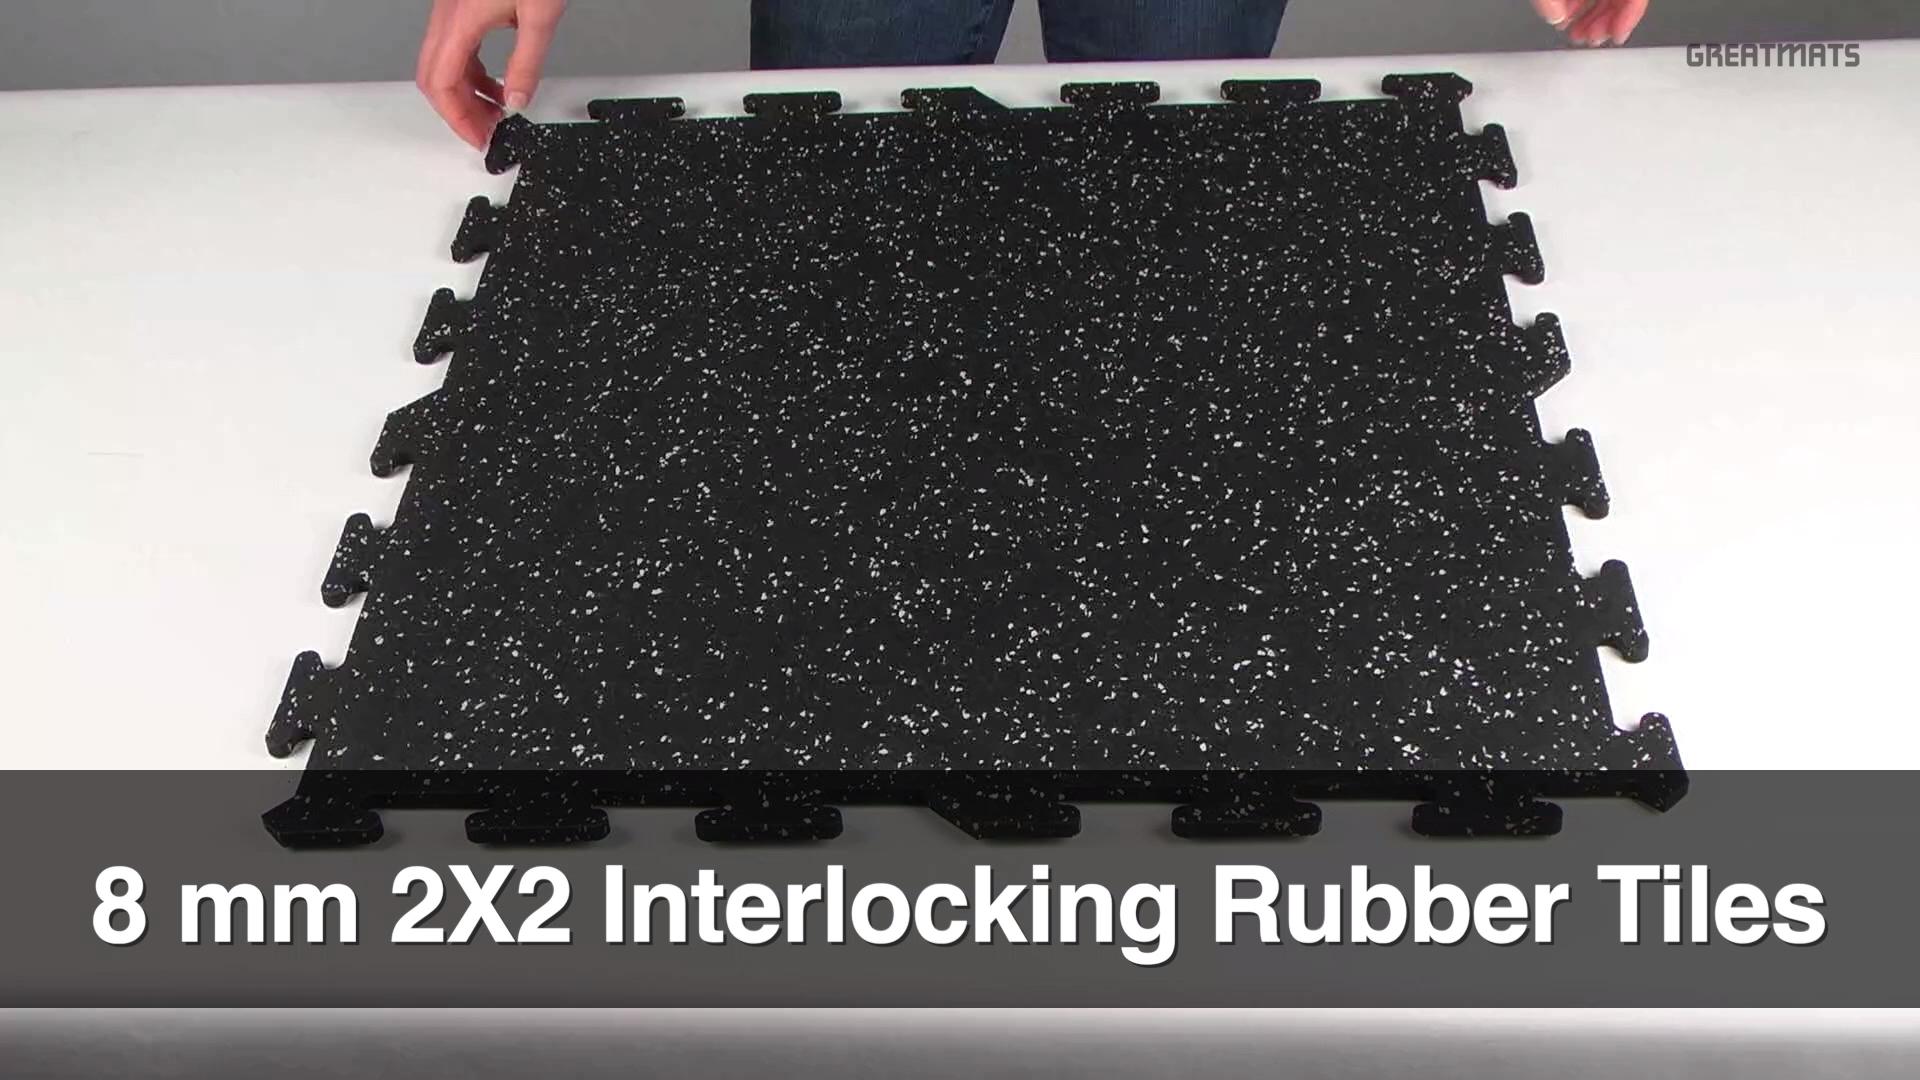 Interlocking Rubber Floor Tiles - 8mm - 2x2 -   19 fitness Room mall ideas